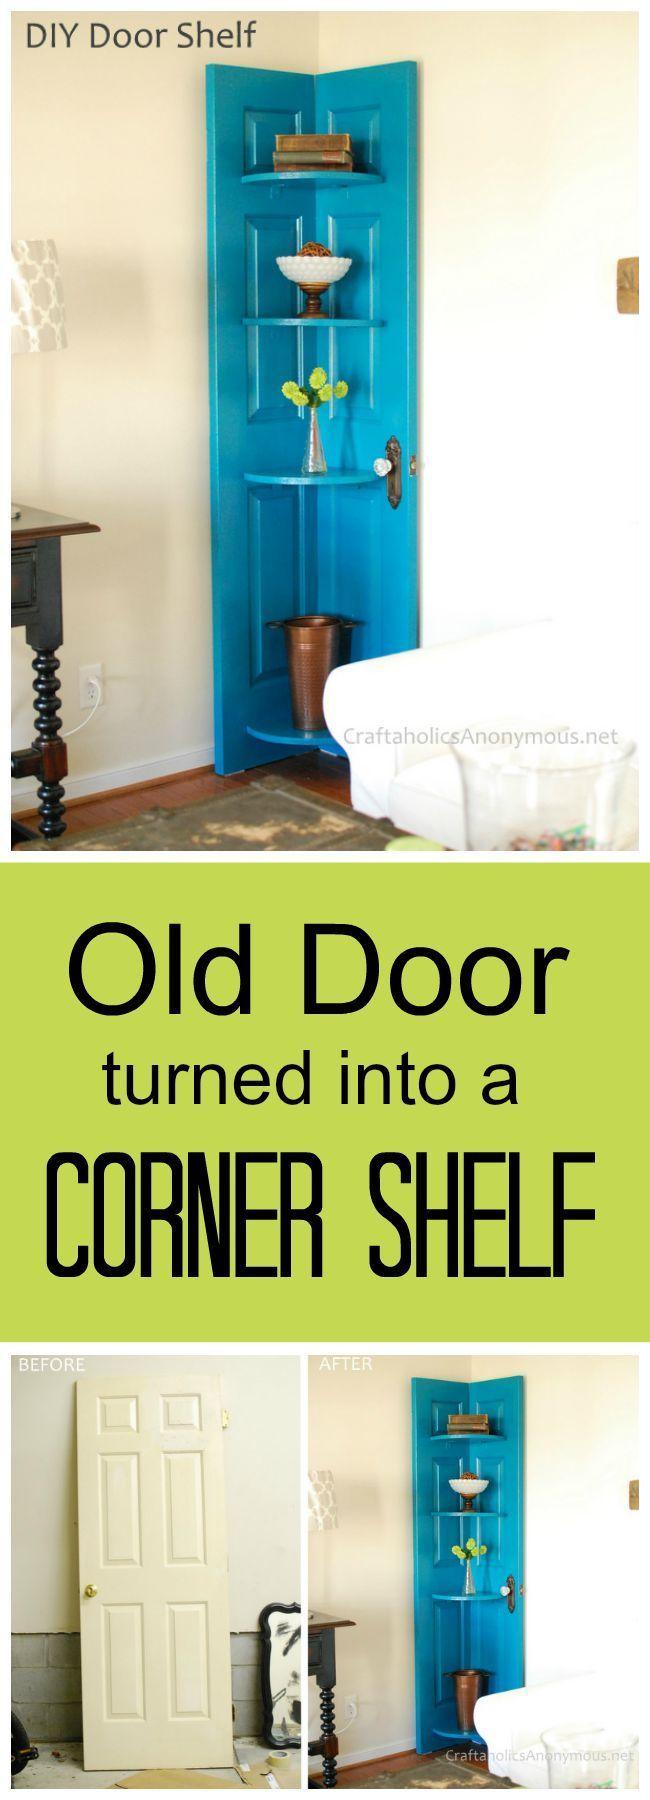 DIY Door Corner Shelf tutorial :: How to turn a door into a DIY corner shelf. Great way to use those hard to decorate corners + it makes cool home decor!